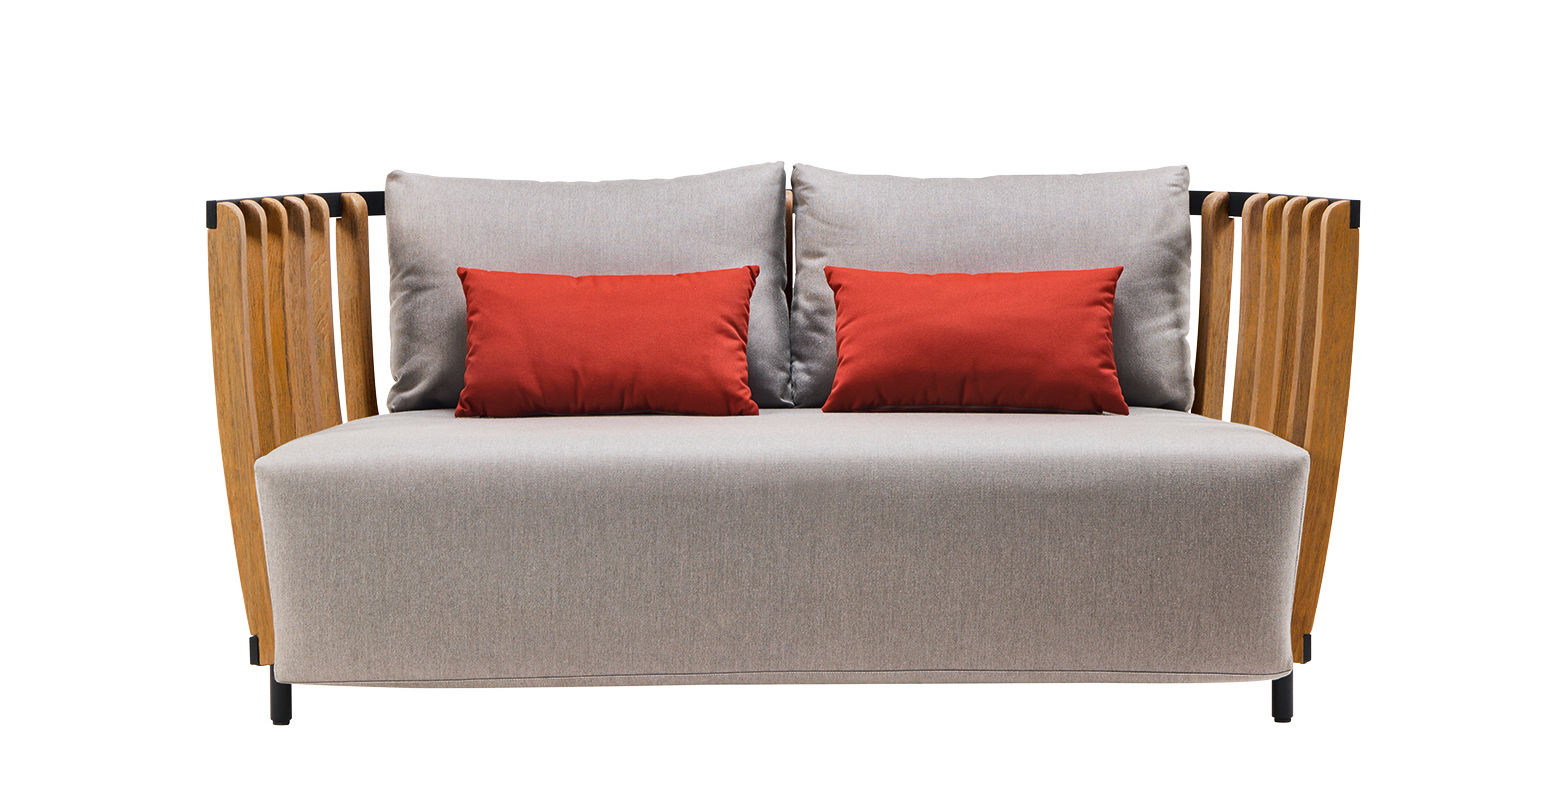 Möbel - Sofas - Swing Sofa / L 166 cm - Ethimo - Schwarz & Teakholz / Stoff grau - lackiertes Aluminium, Polyacryl-Gewebe, Schaumstoff, Teck naturel